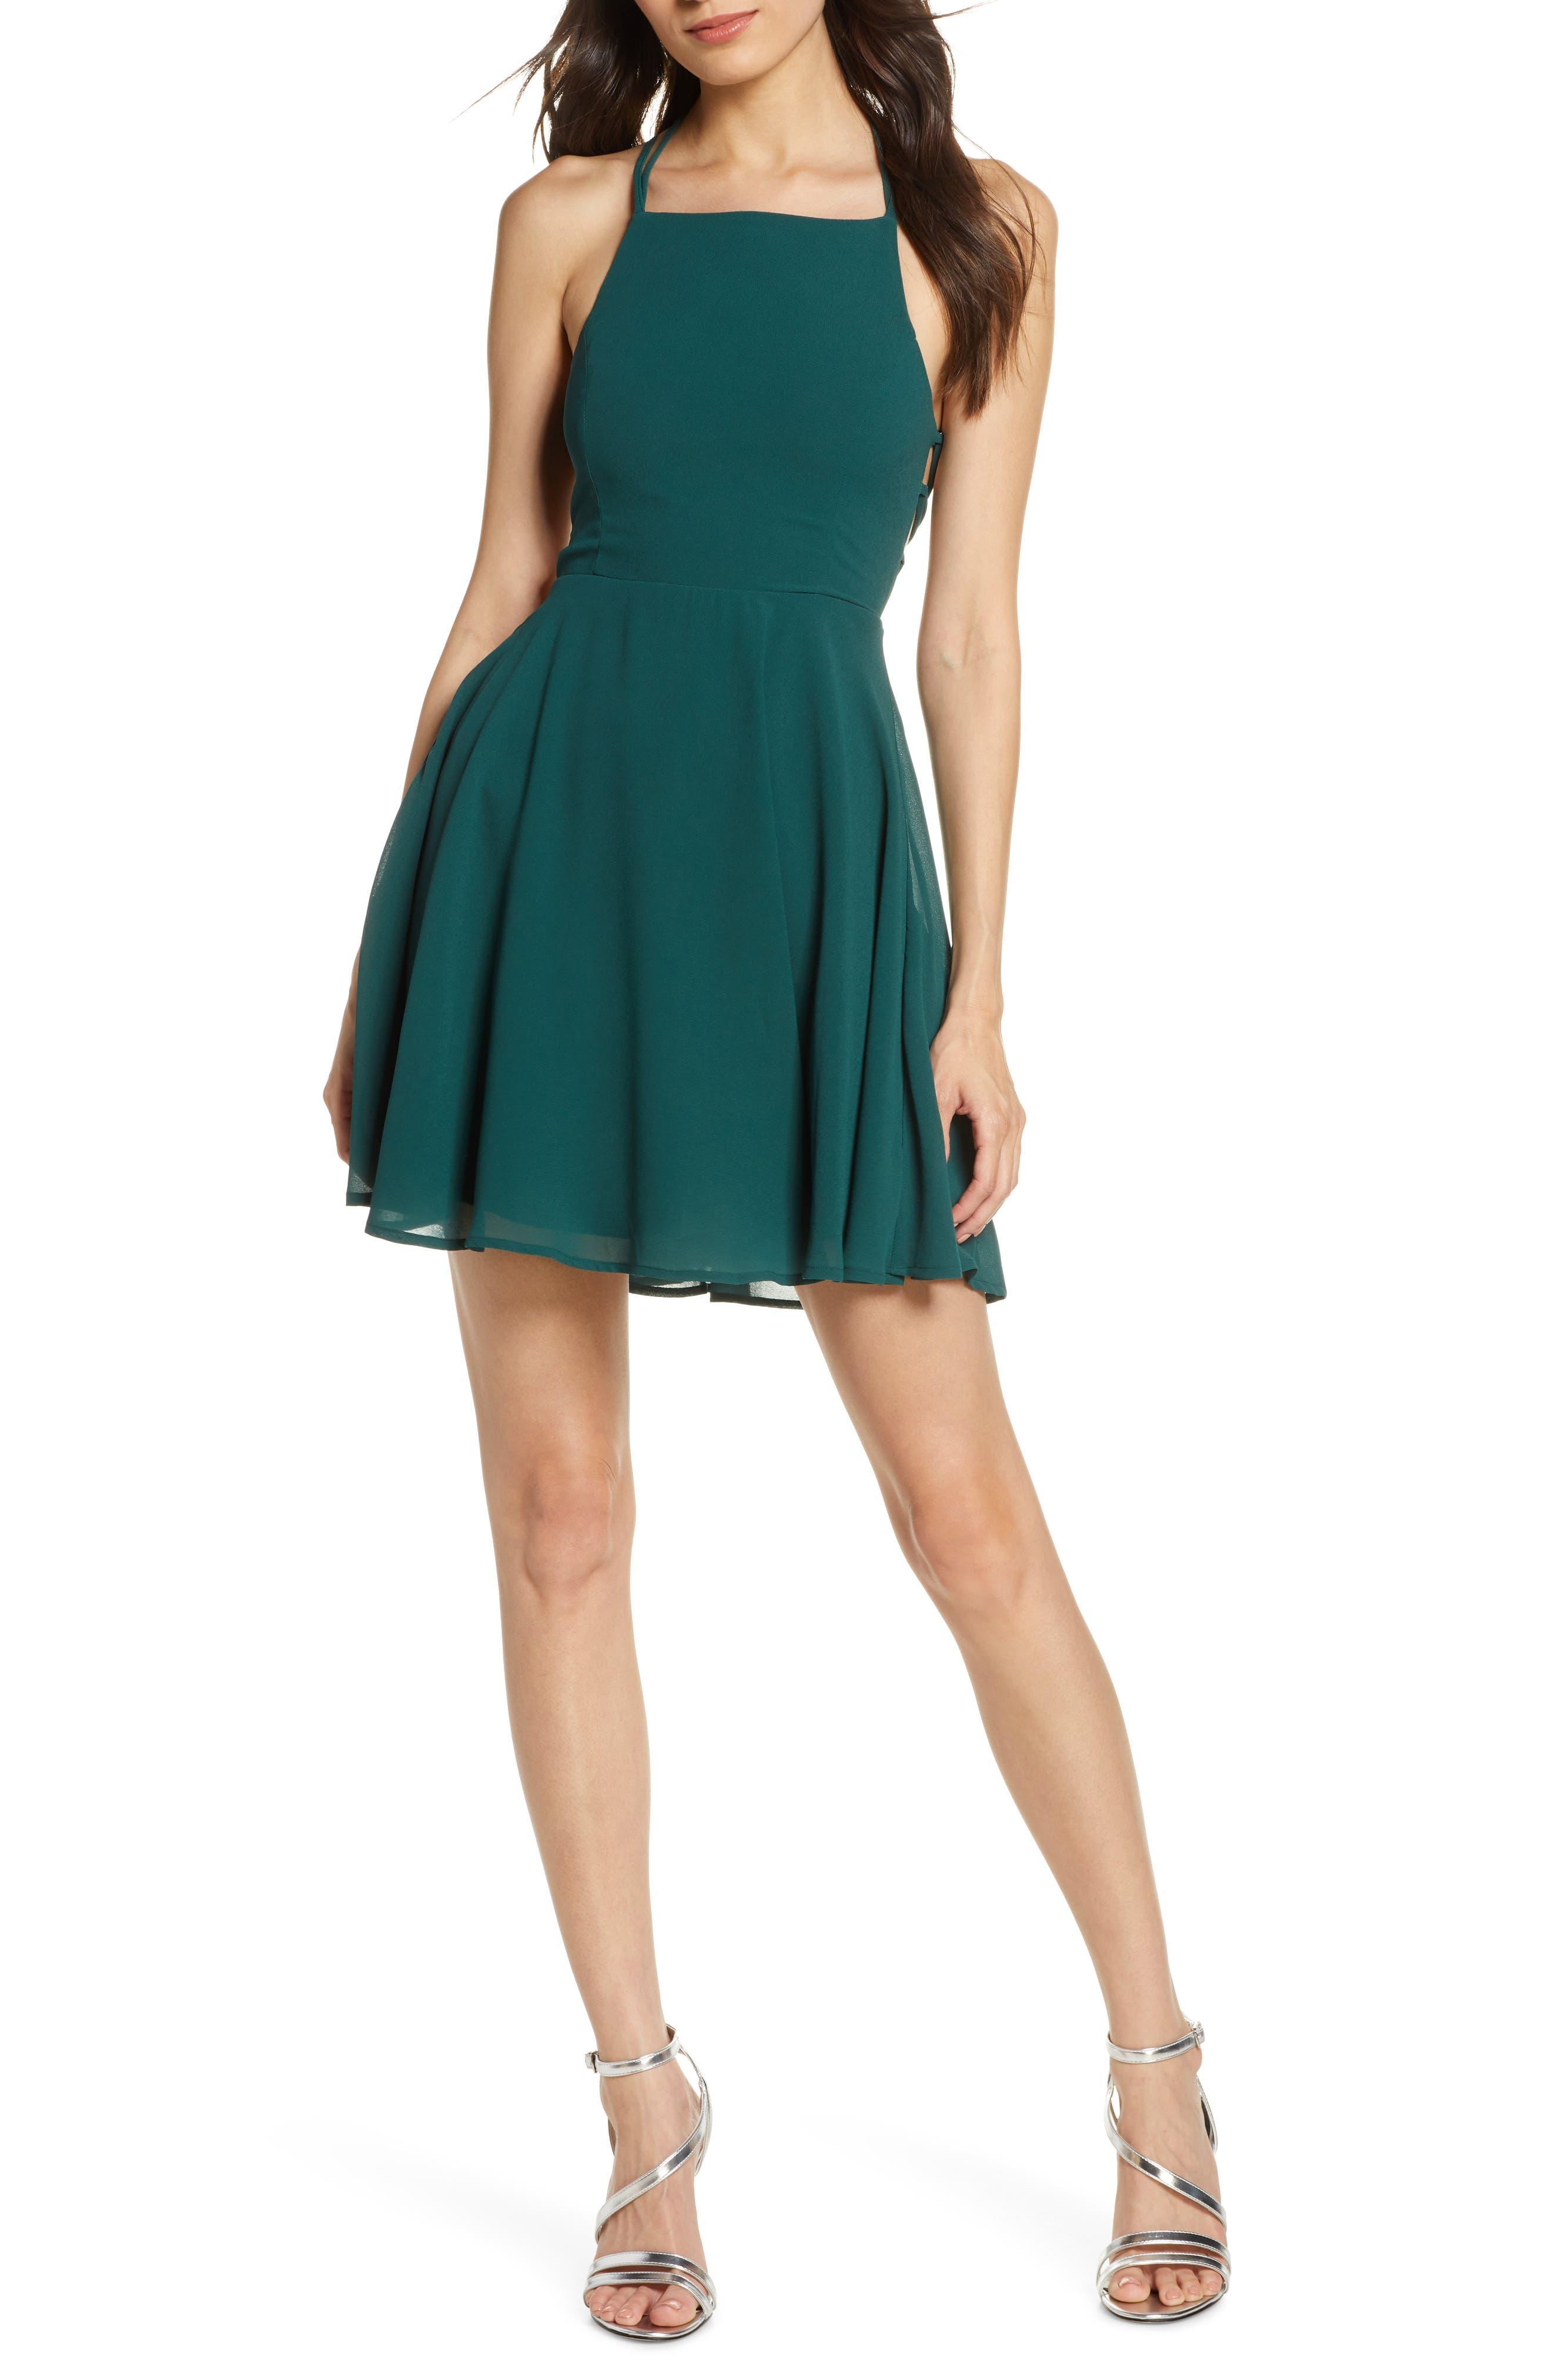 Lulus Good Deeds Lace-Up Skater Dress, Green